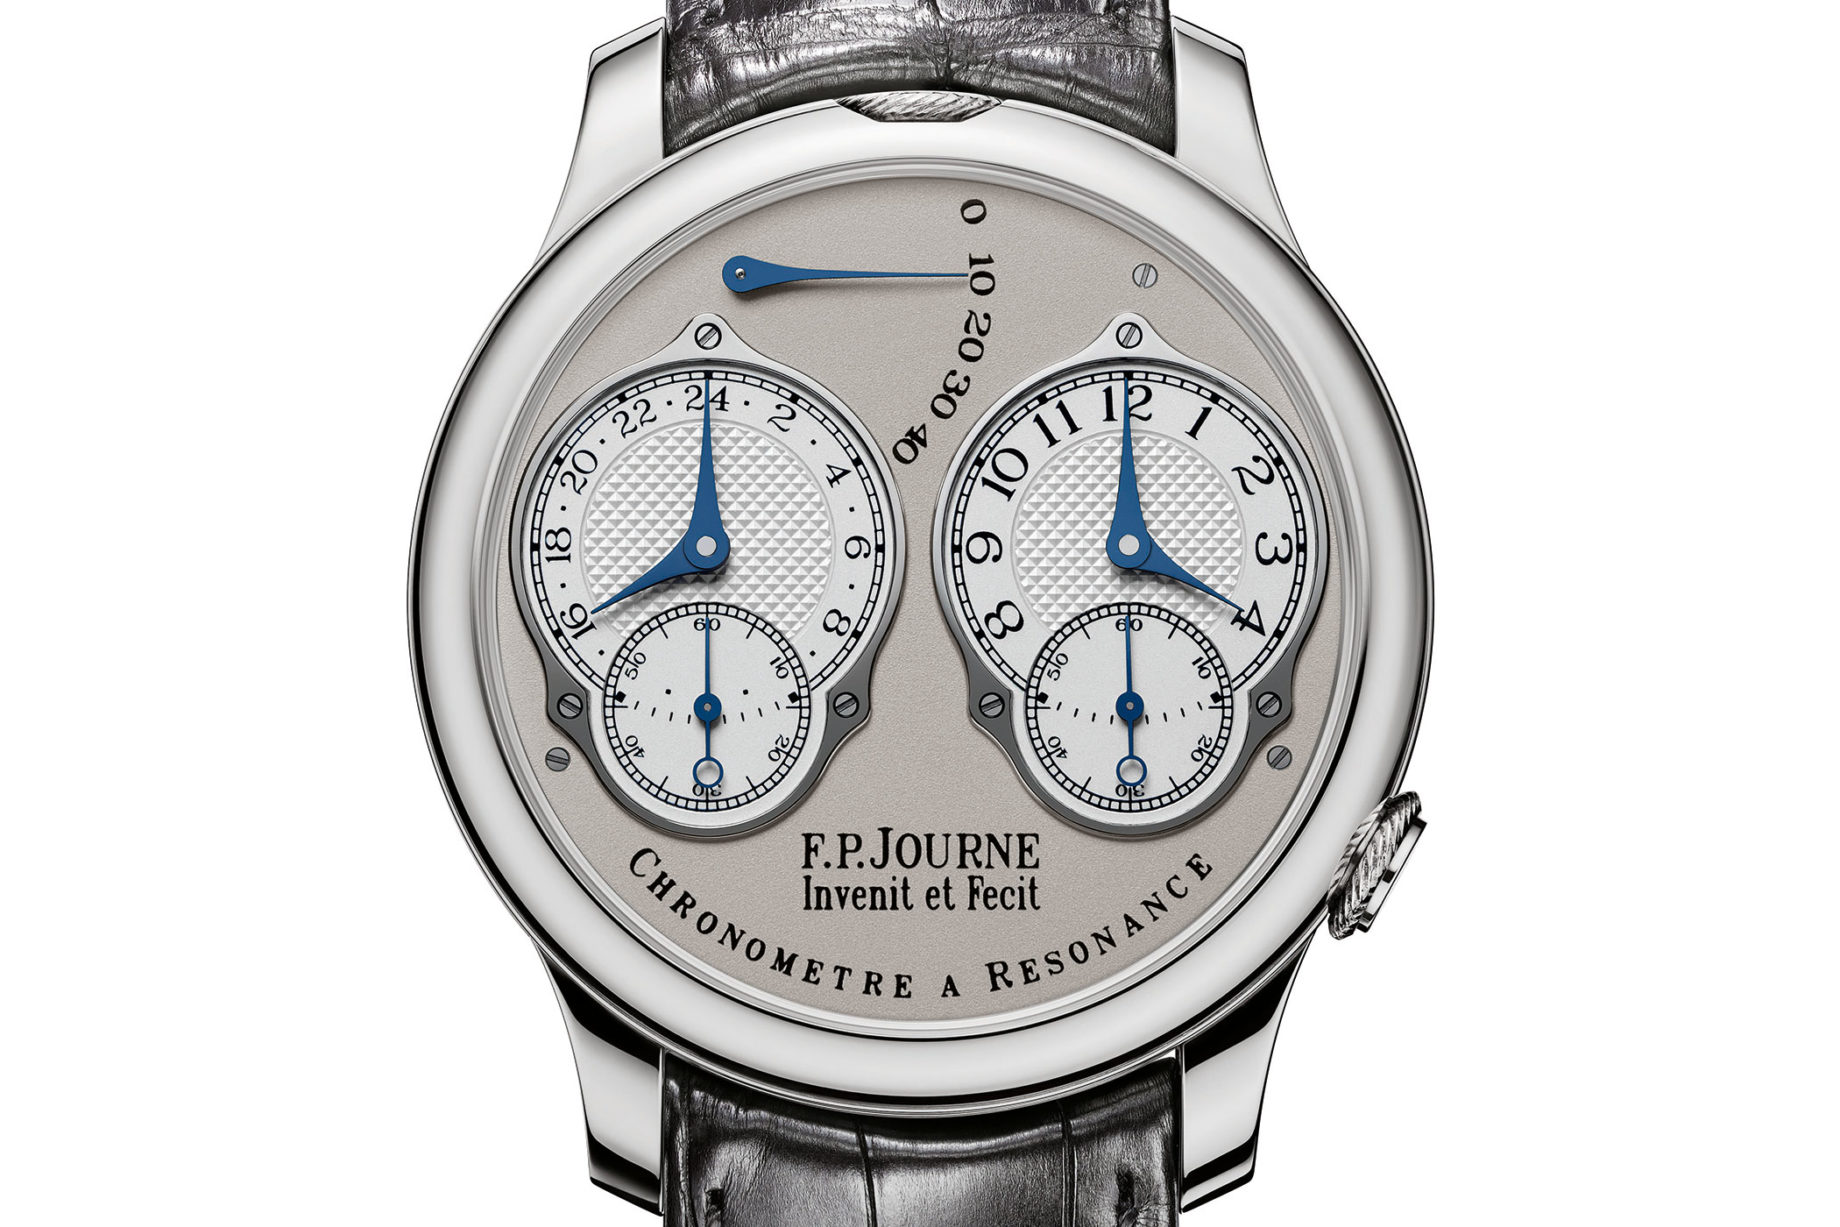 F.P. Journe Chronometre a Resonance 24 Hour